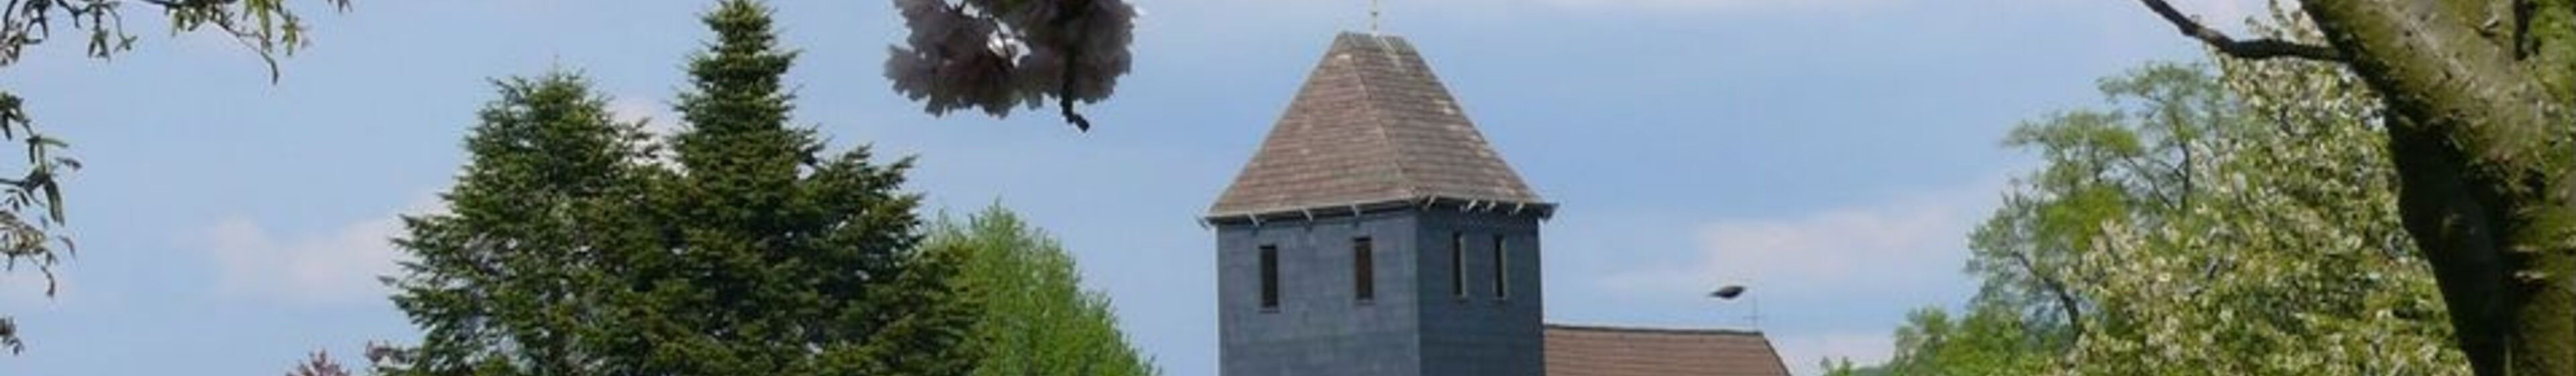 Kirche schmal